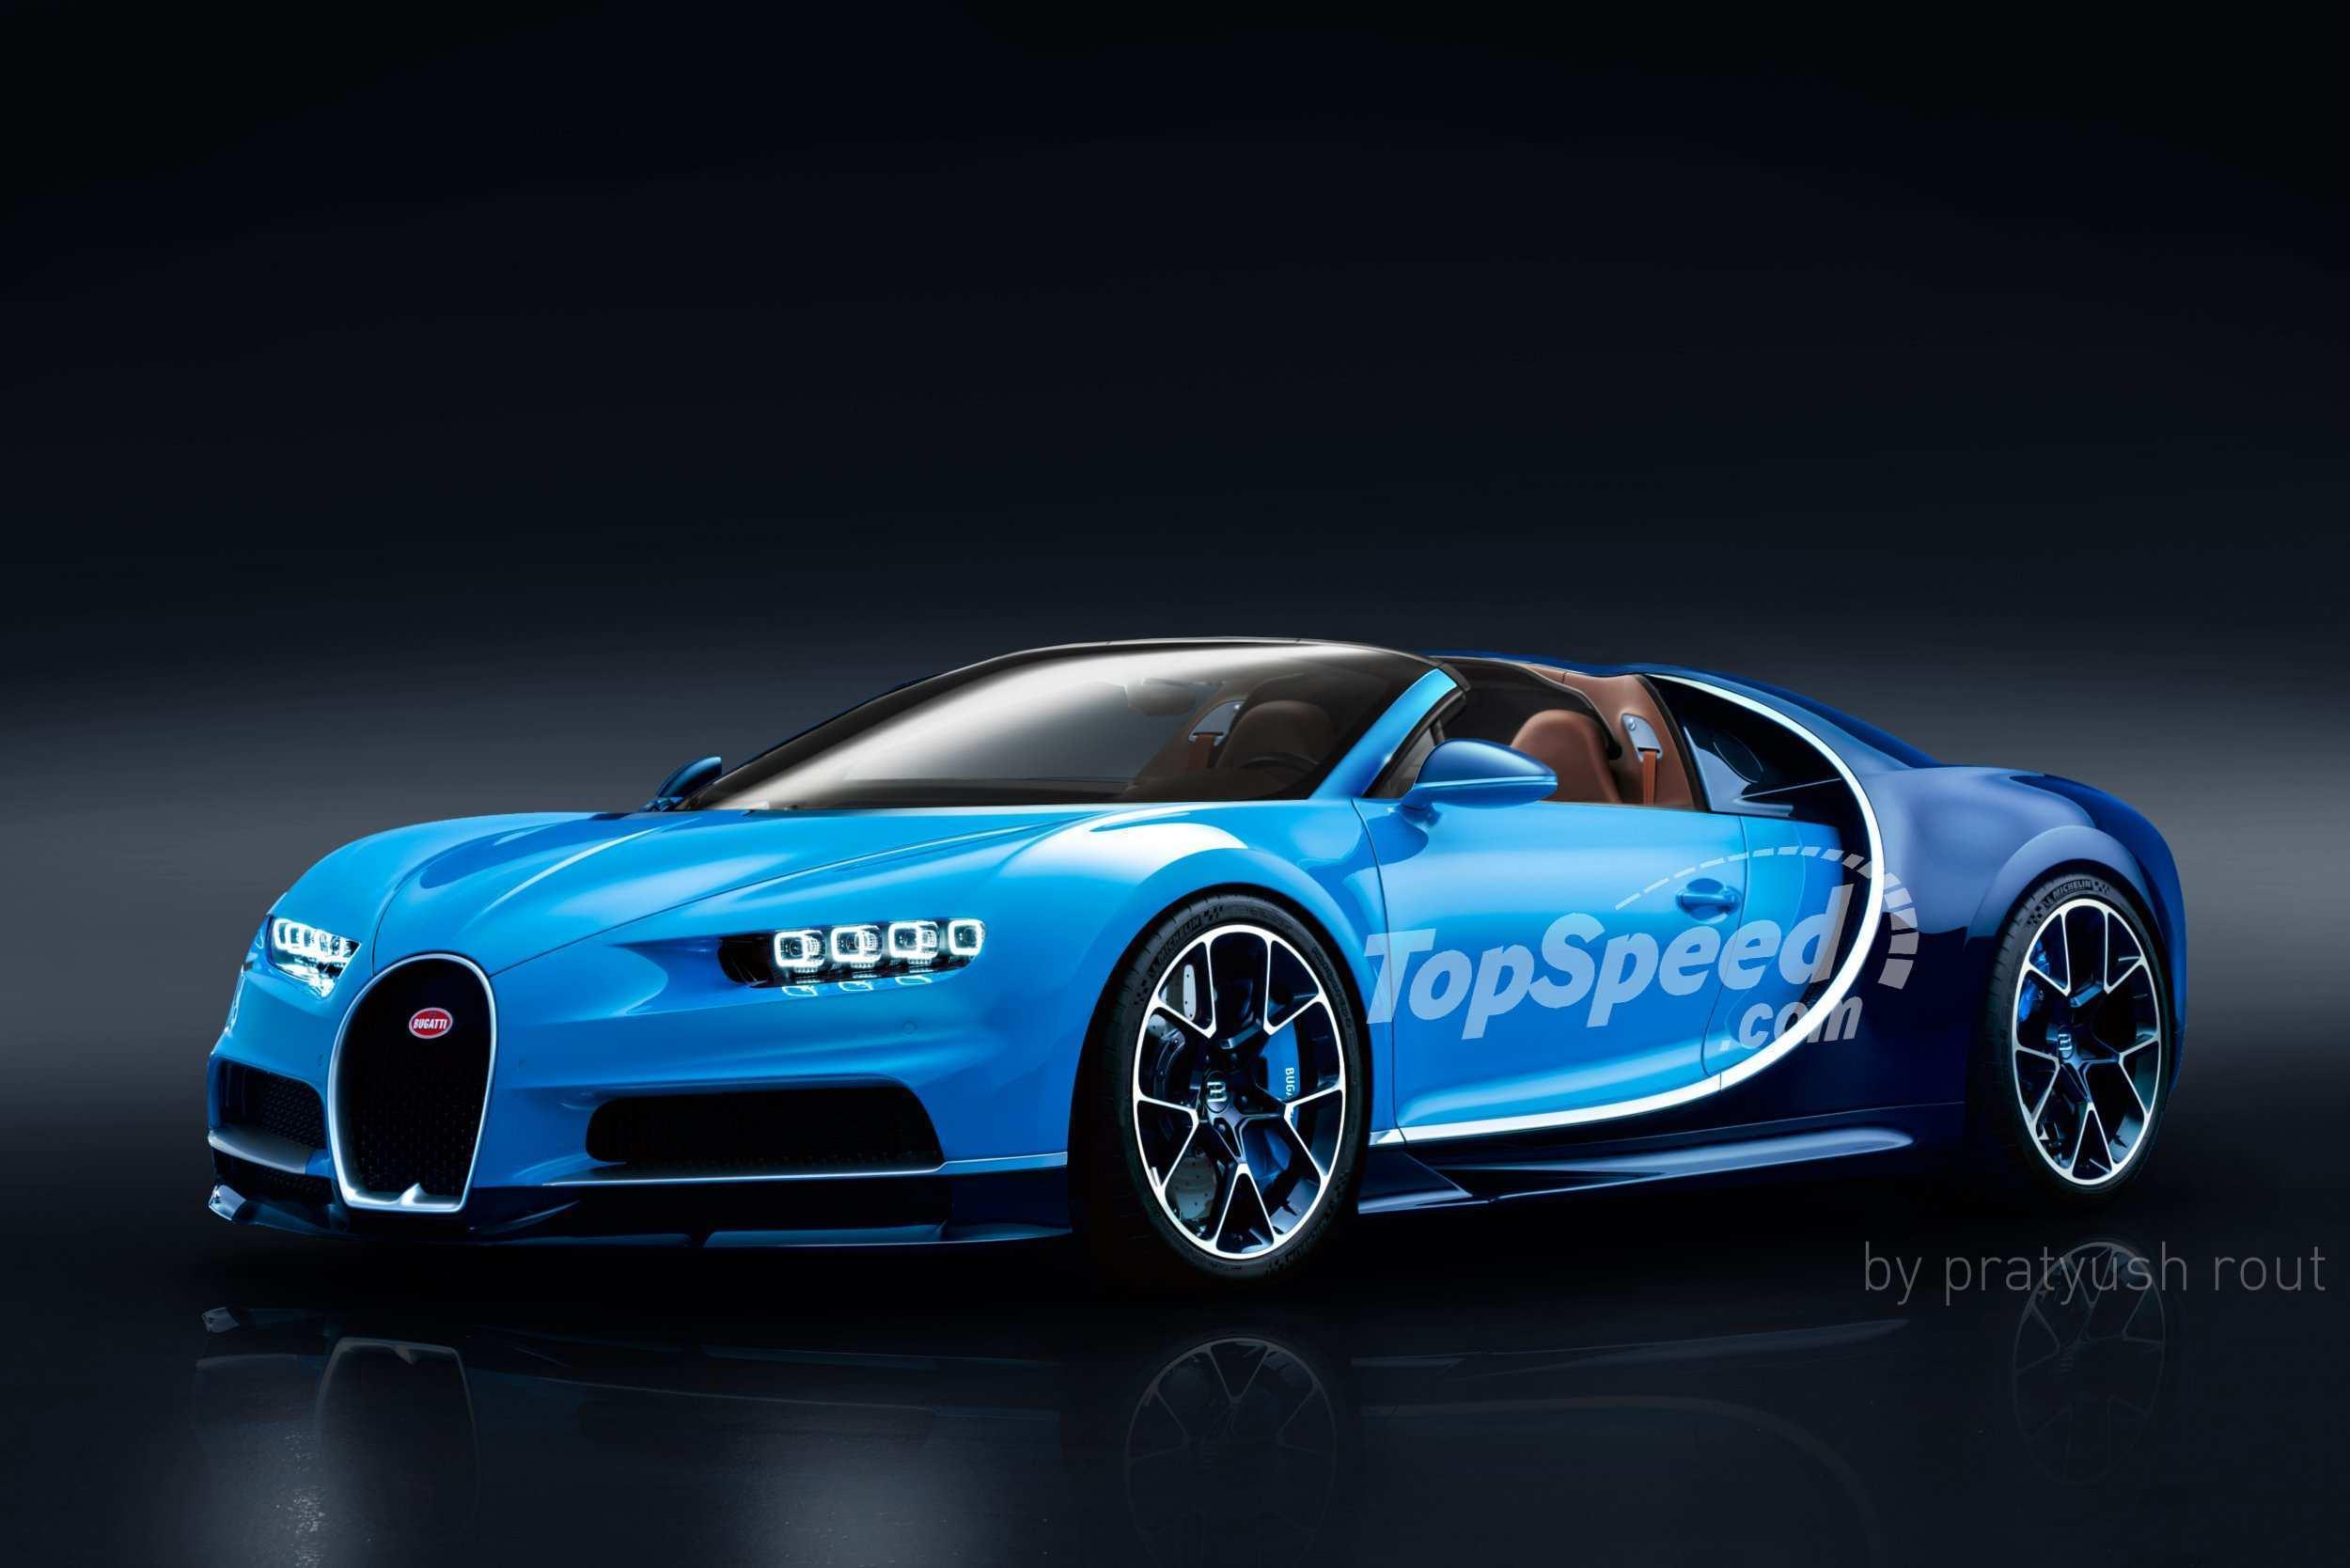 88 New 2020 Bugatti Veyron Specs and Review for 2020 Bugatti Veyron